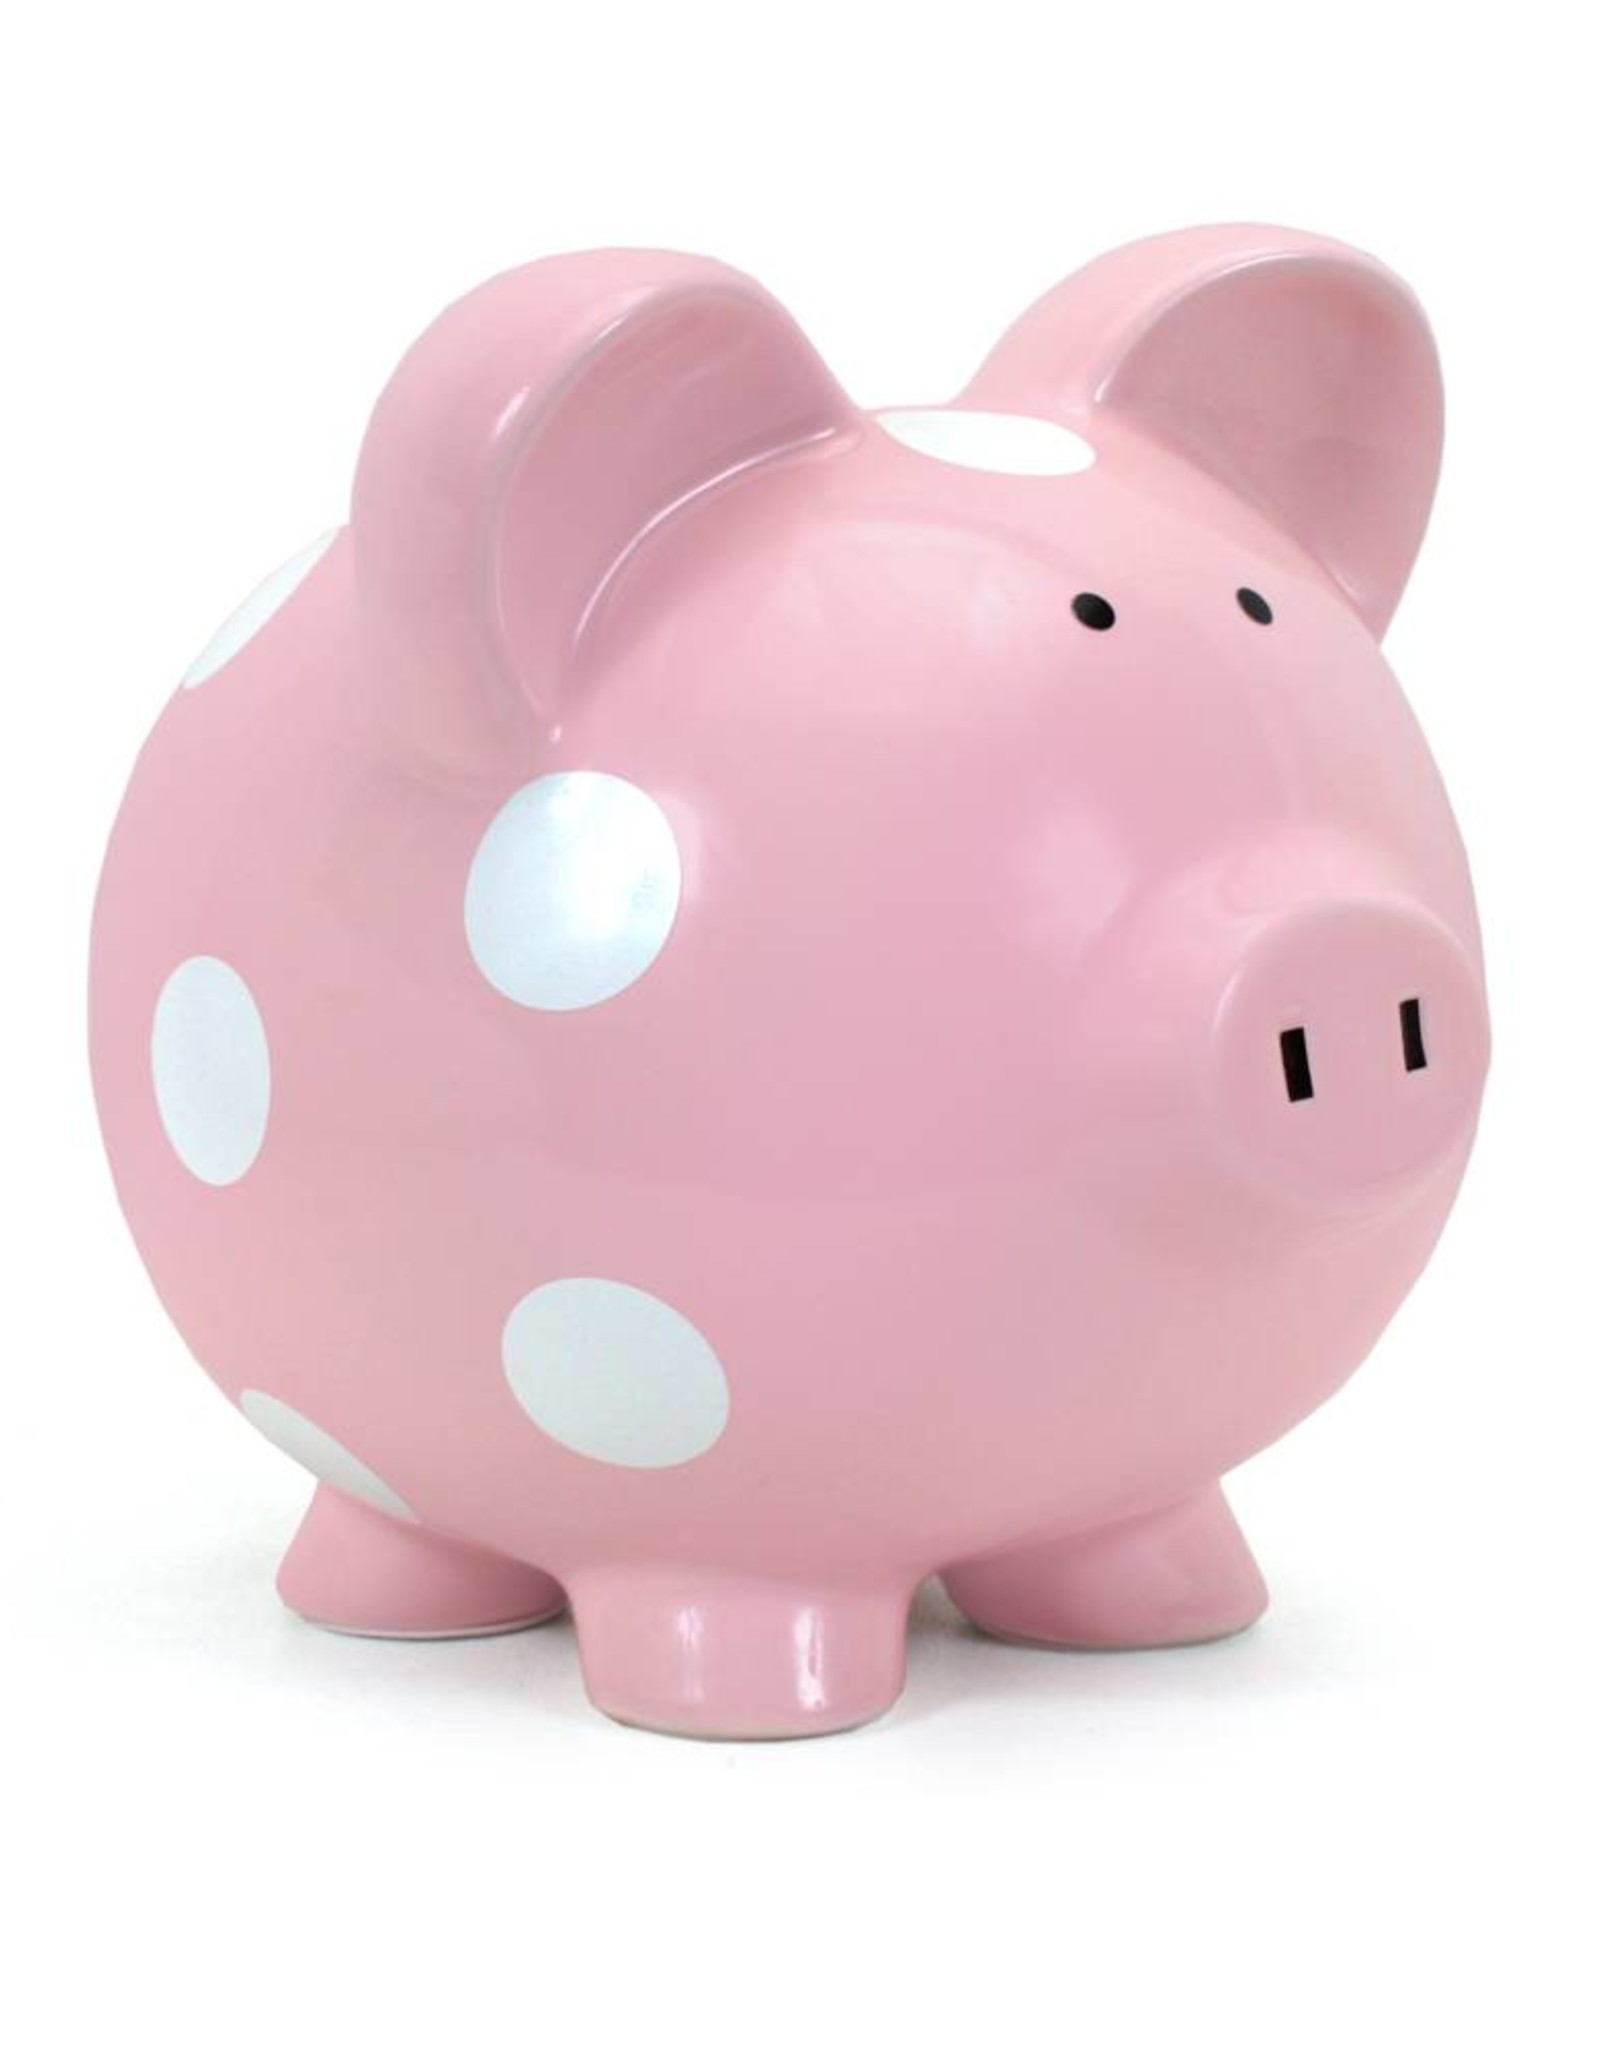 Child to Cherish Pink Dot Bank